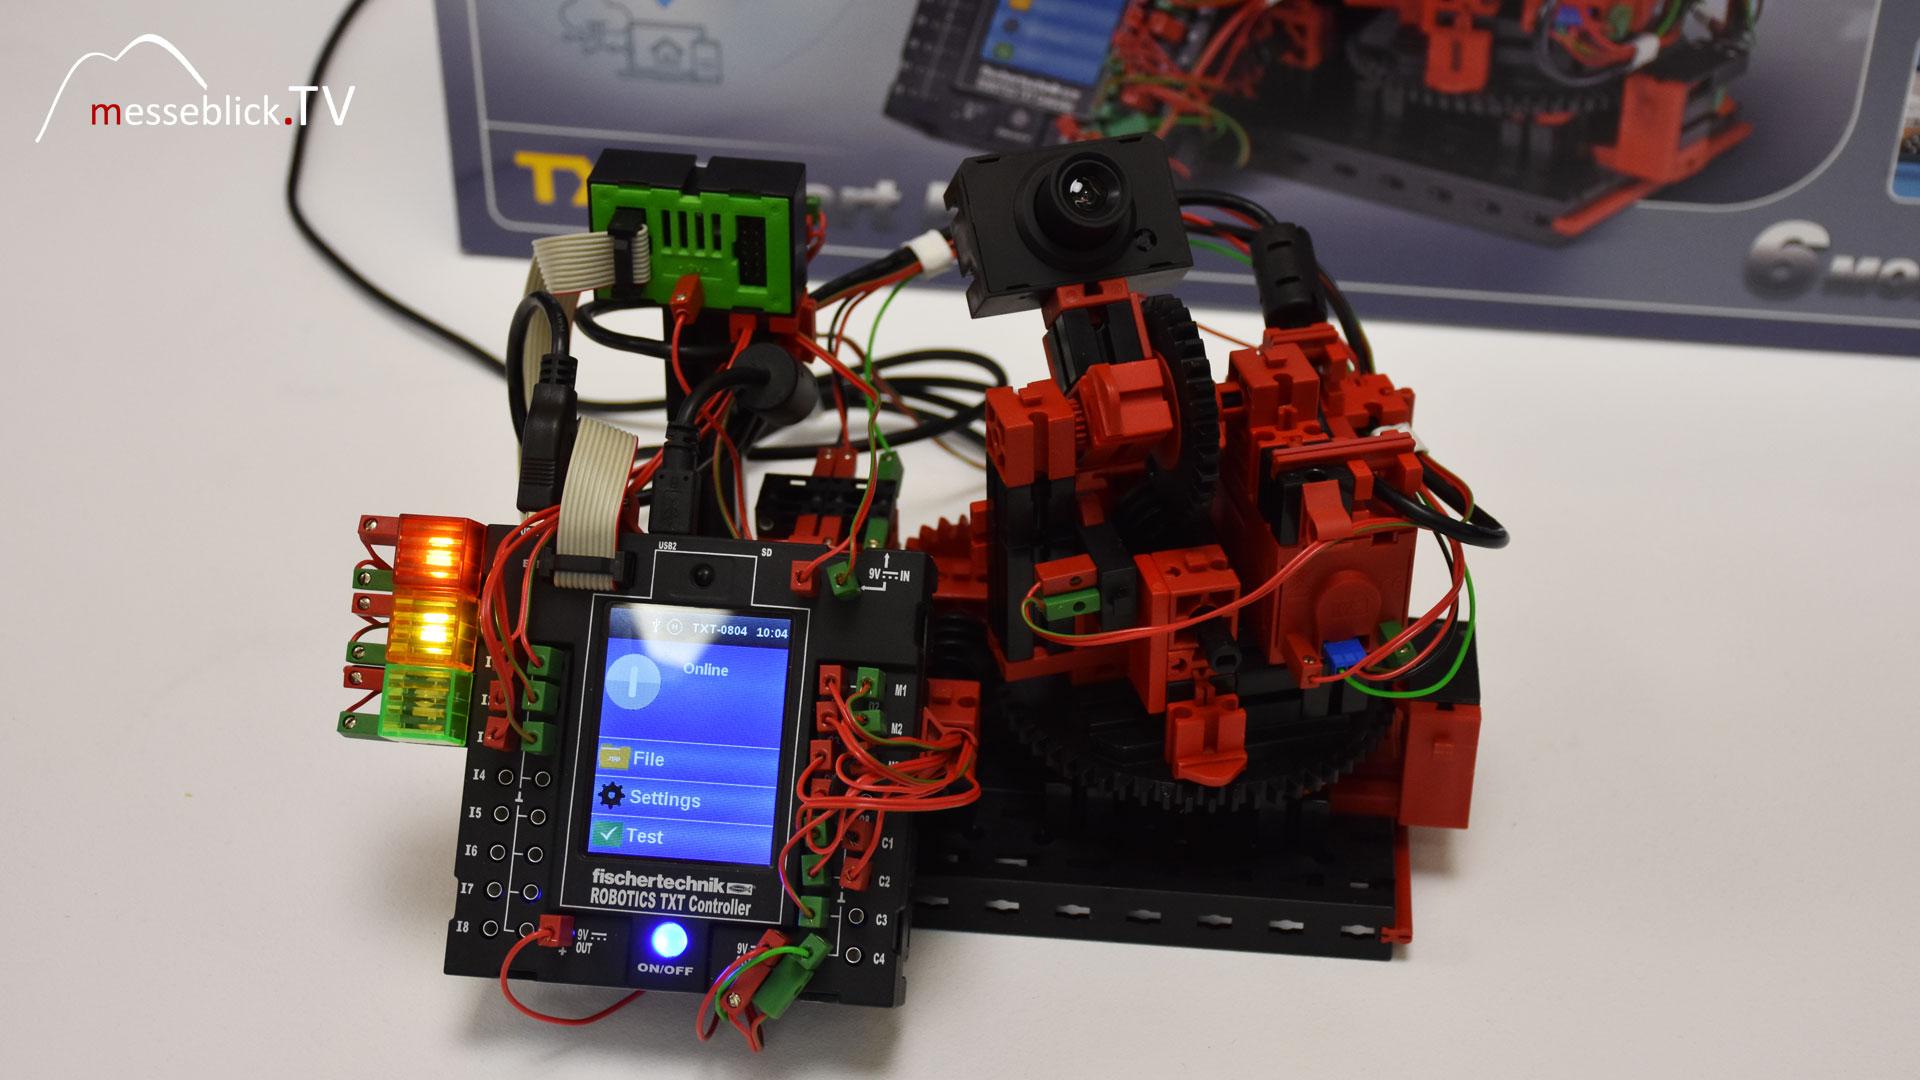 Fischertechnik - Robotics TXT Controller